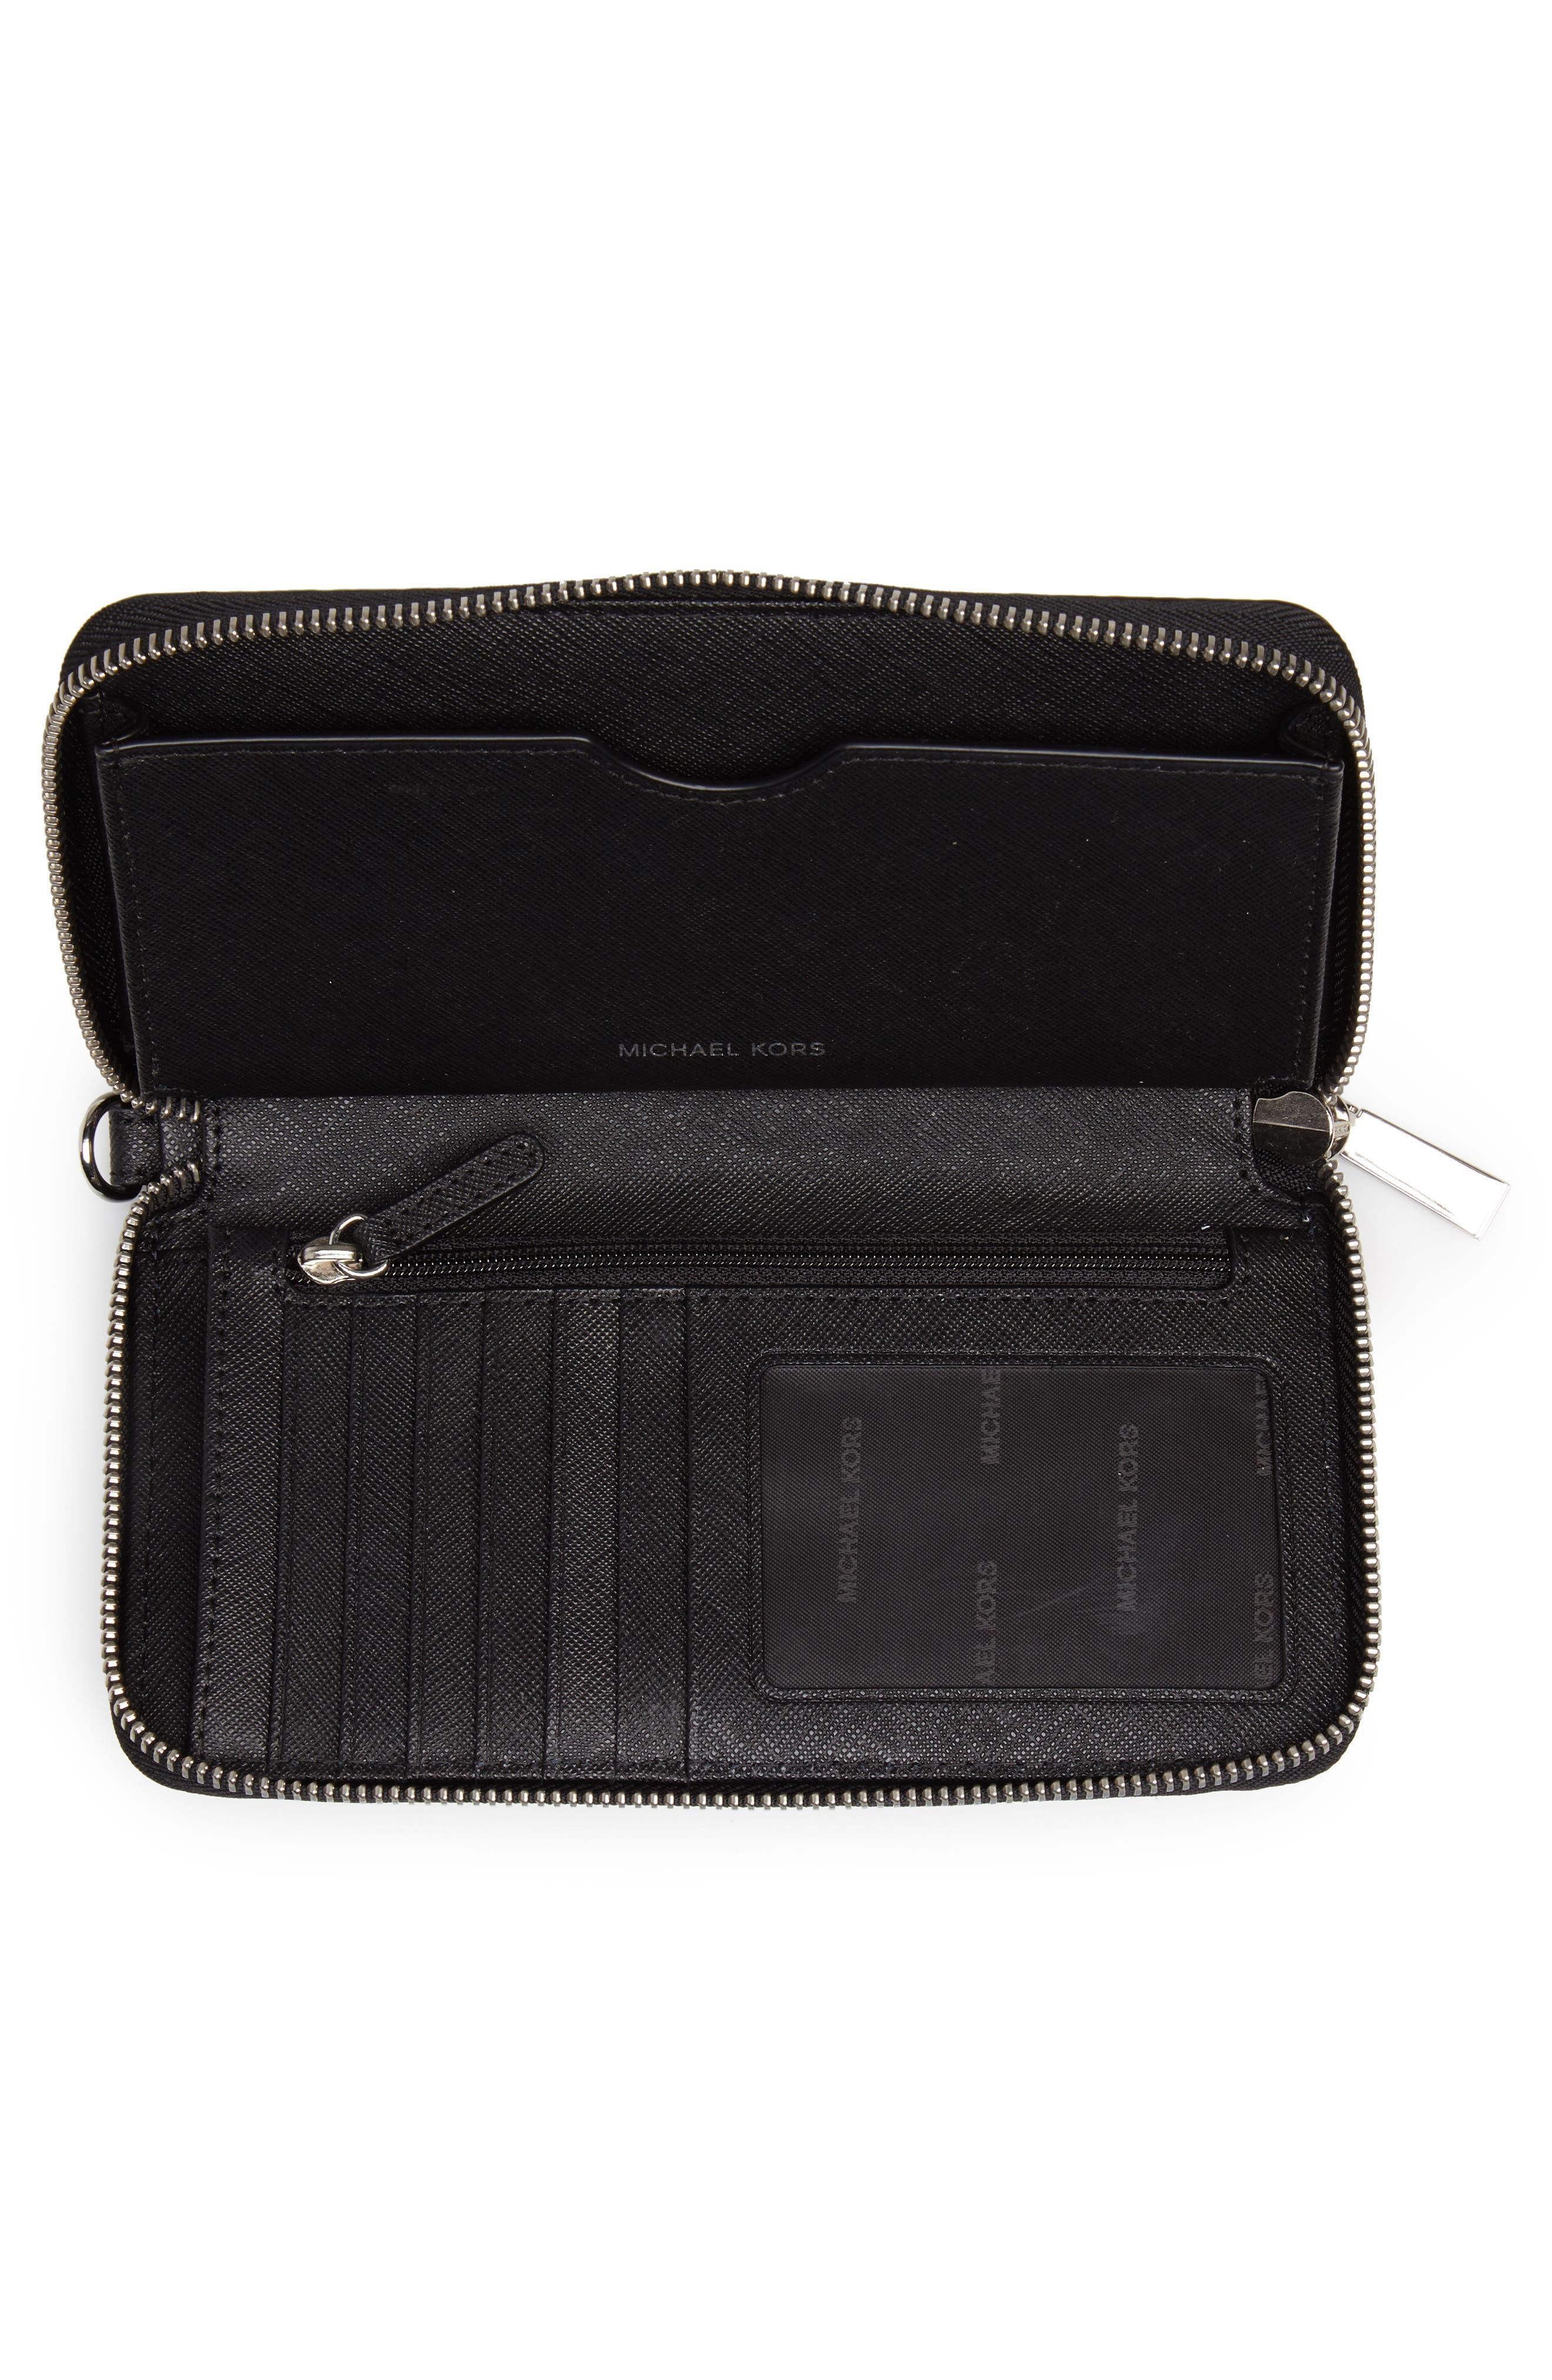 Mercer Large Leather Wristlet,                             Alternate thumbnail 2, color,                             Black